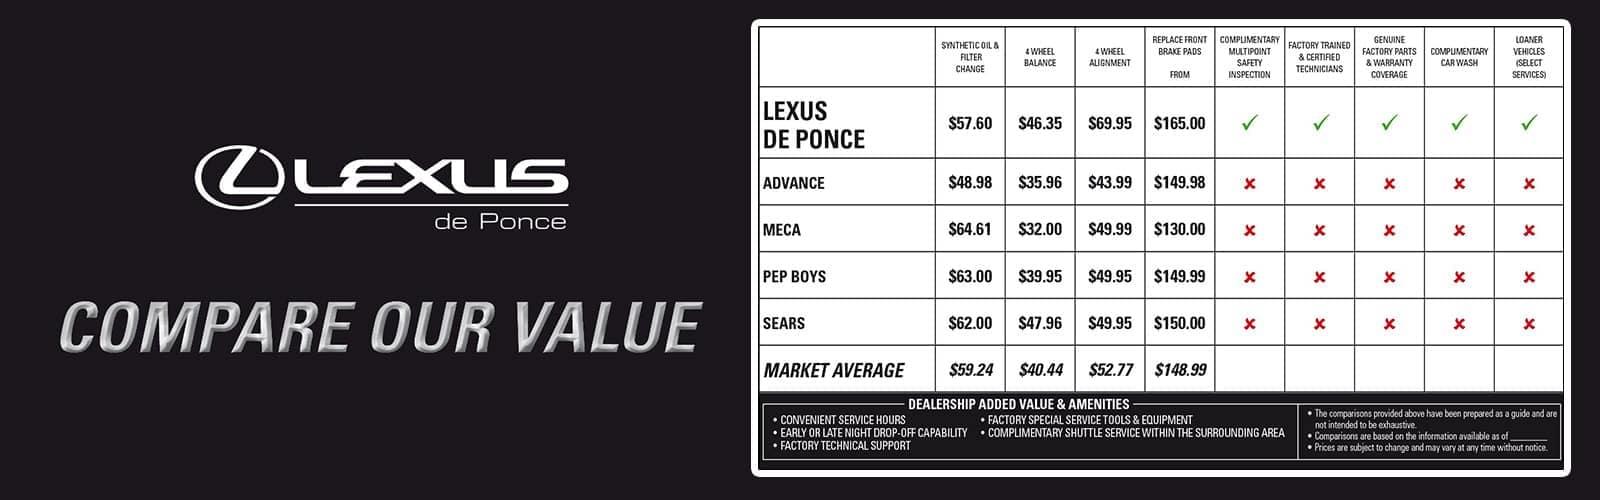 Compare Our Value